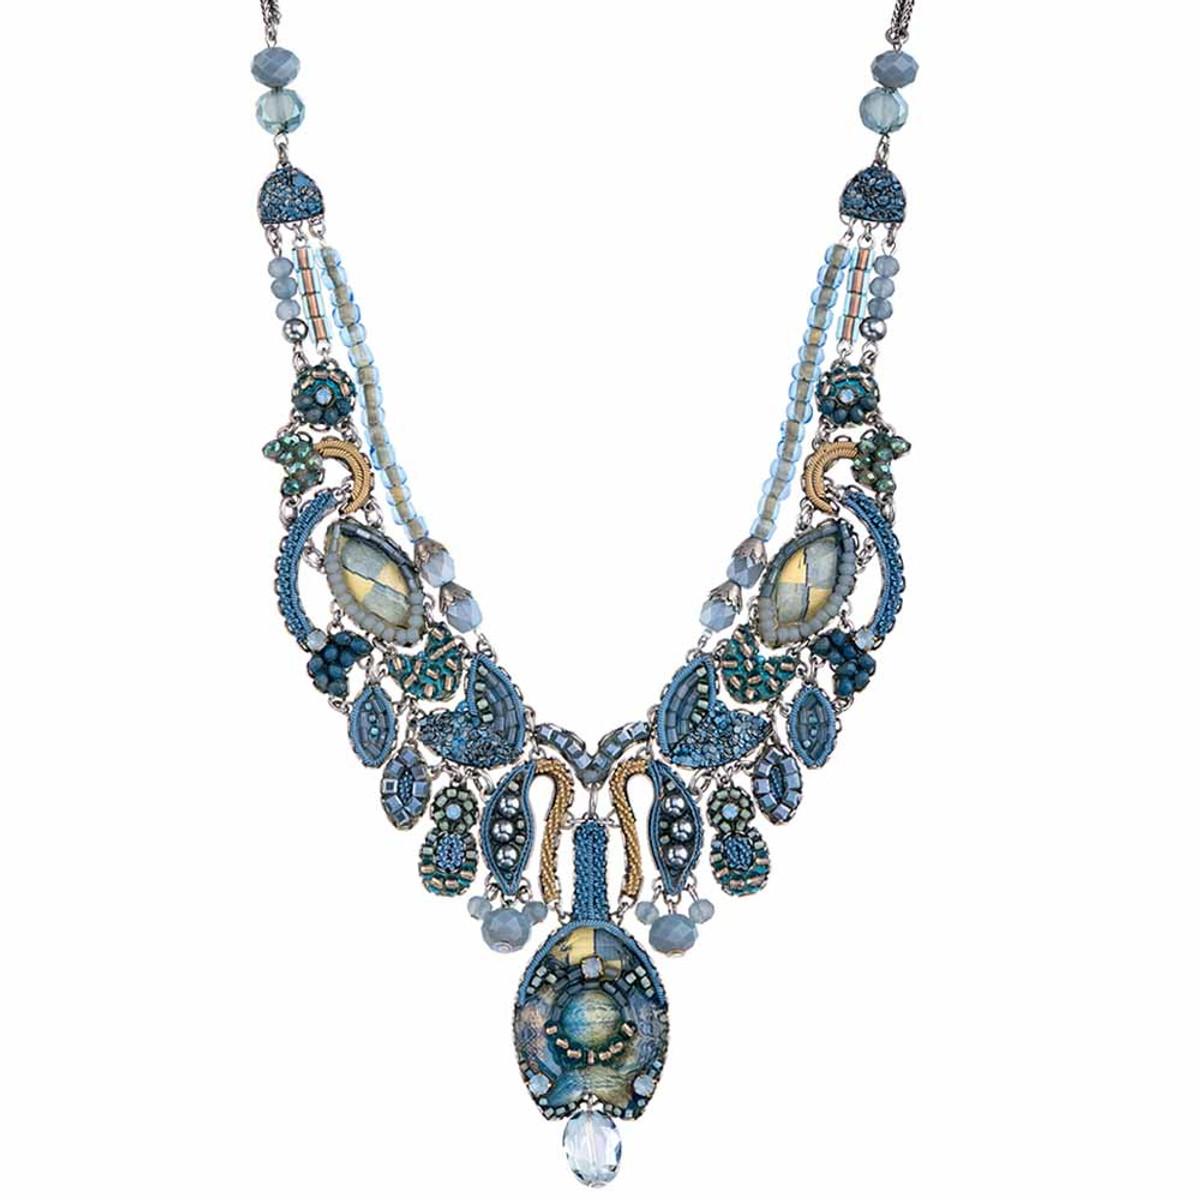 Ayala Bar Magic Potion Waterfall Strength Necklace